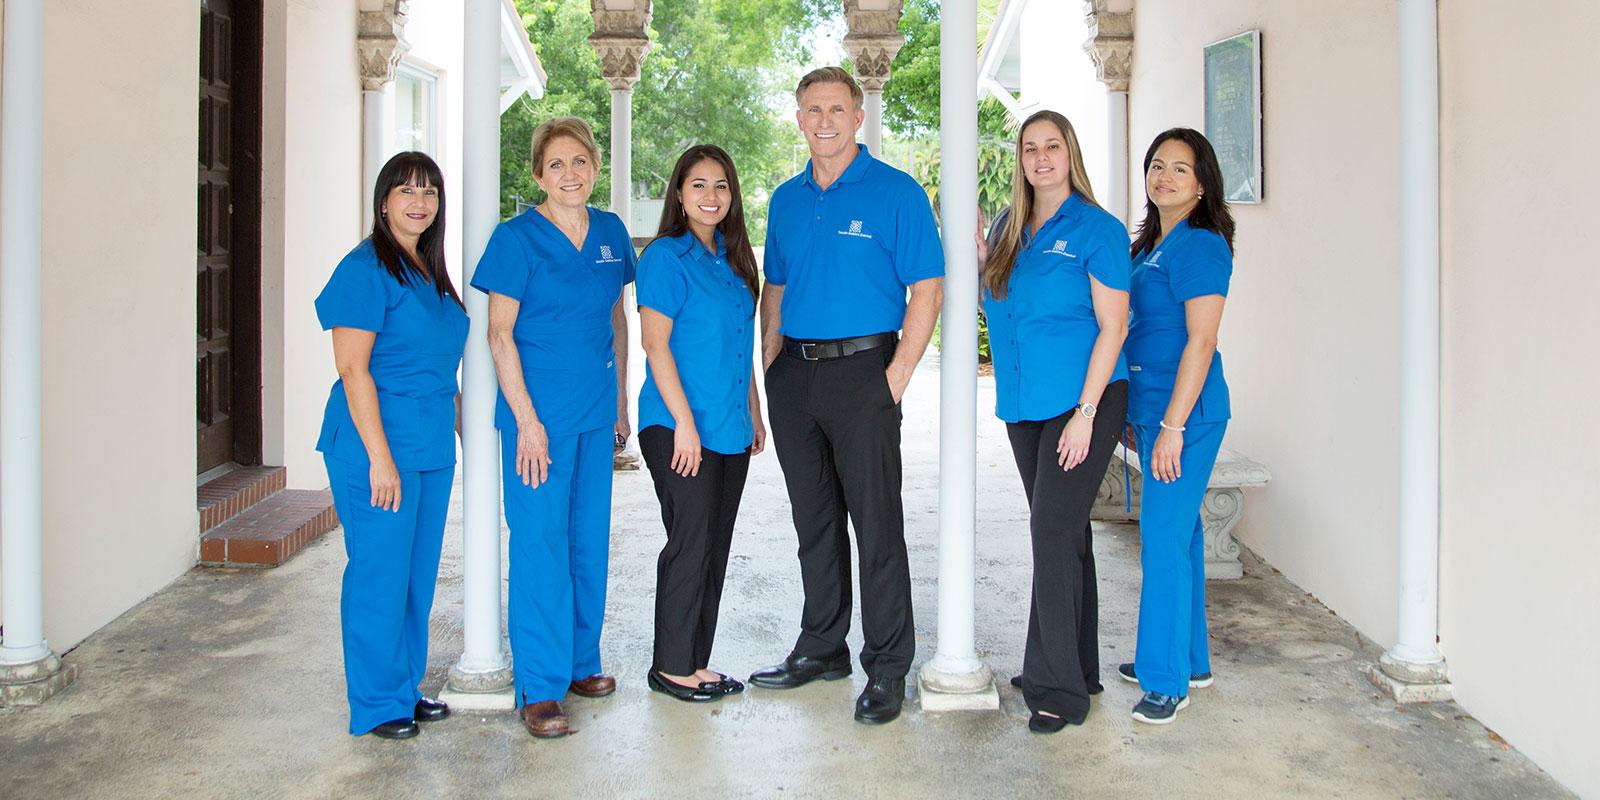 South-Gables-Dental-Team-4